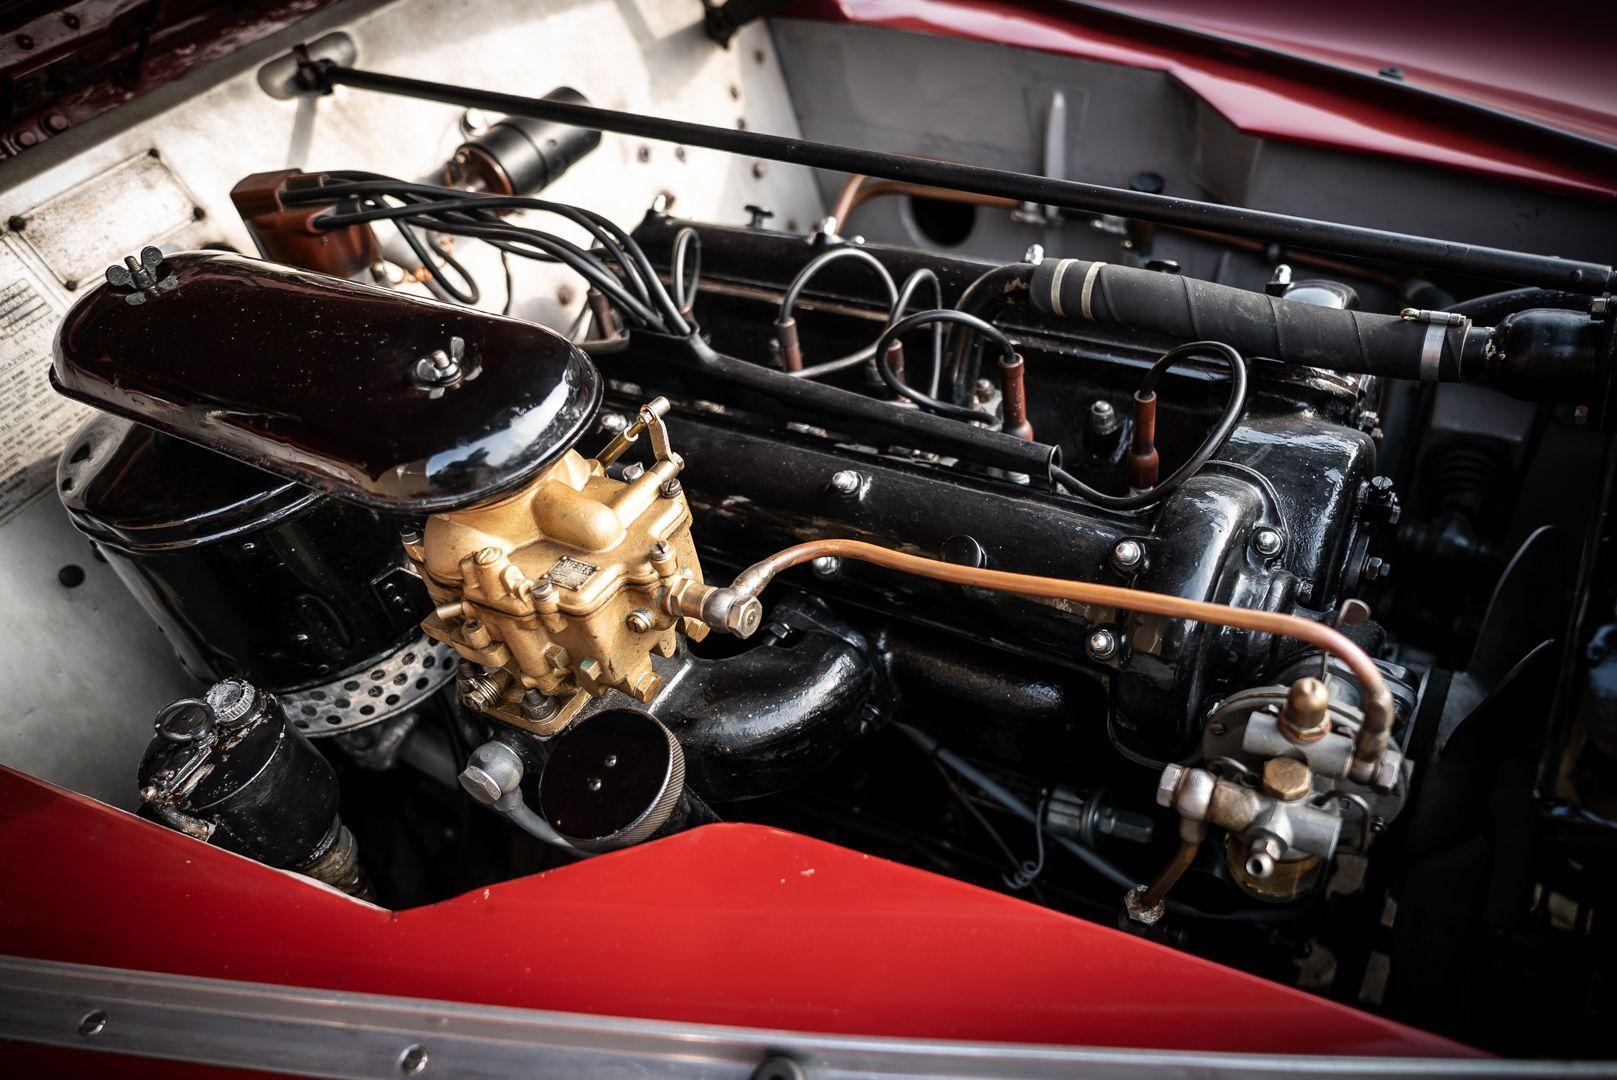 1947 Alfa Romeo Freccia d'oro 6C 2500 Sport 61722